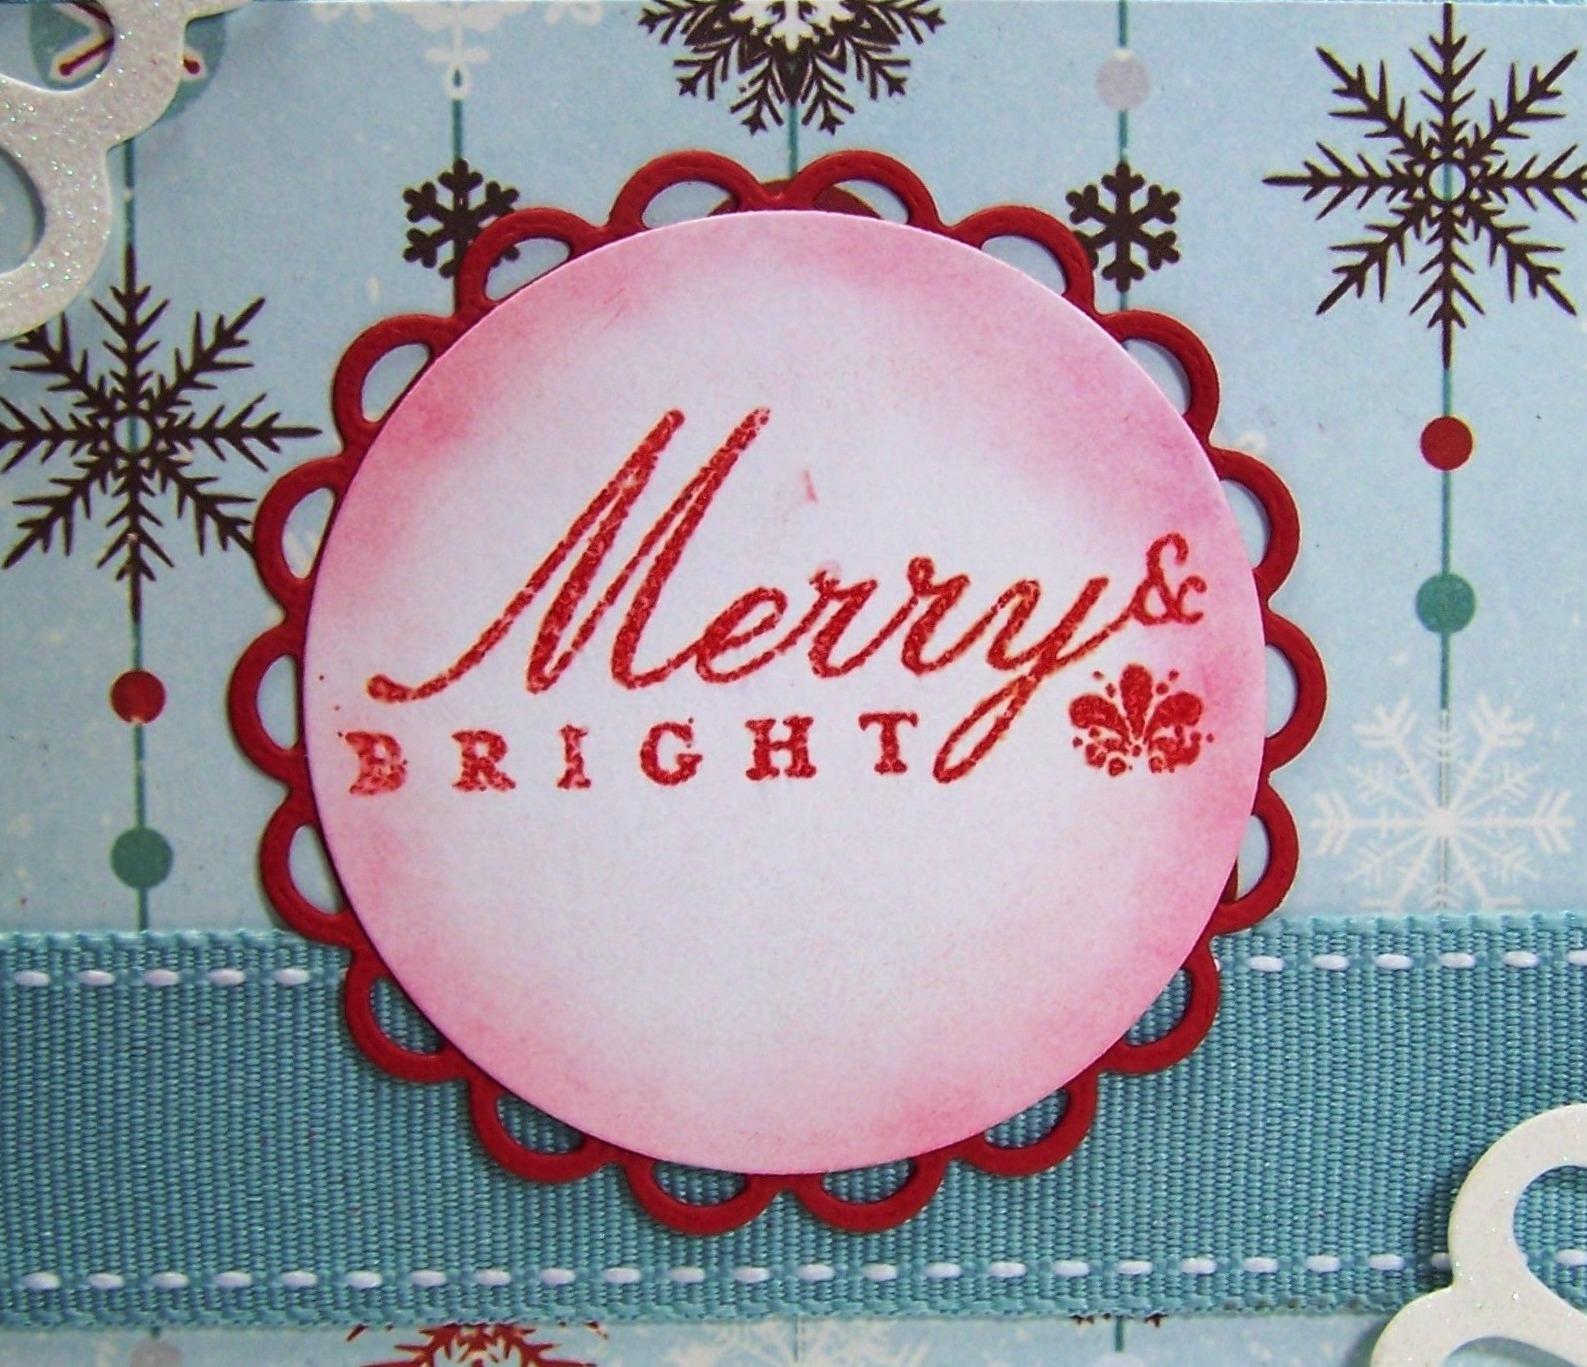 http://3.bp.blogspot.com/_ZzcU0jCbZWo/TRGQFpeUEzI/AAAAAAAAEsE/Q_B2T2xDWT4/s1600/Christmas%20Projects%20015.JPG